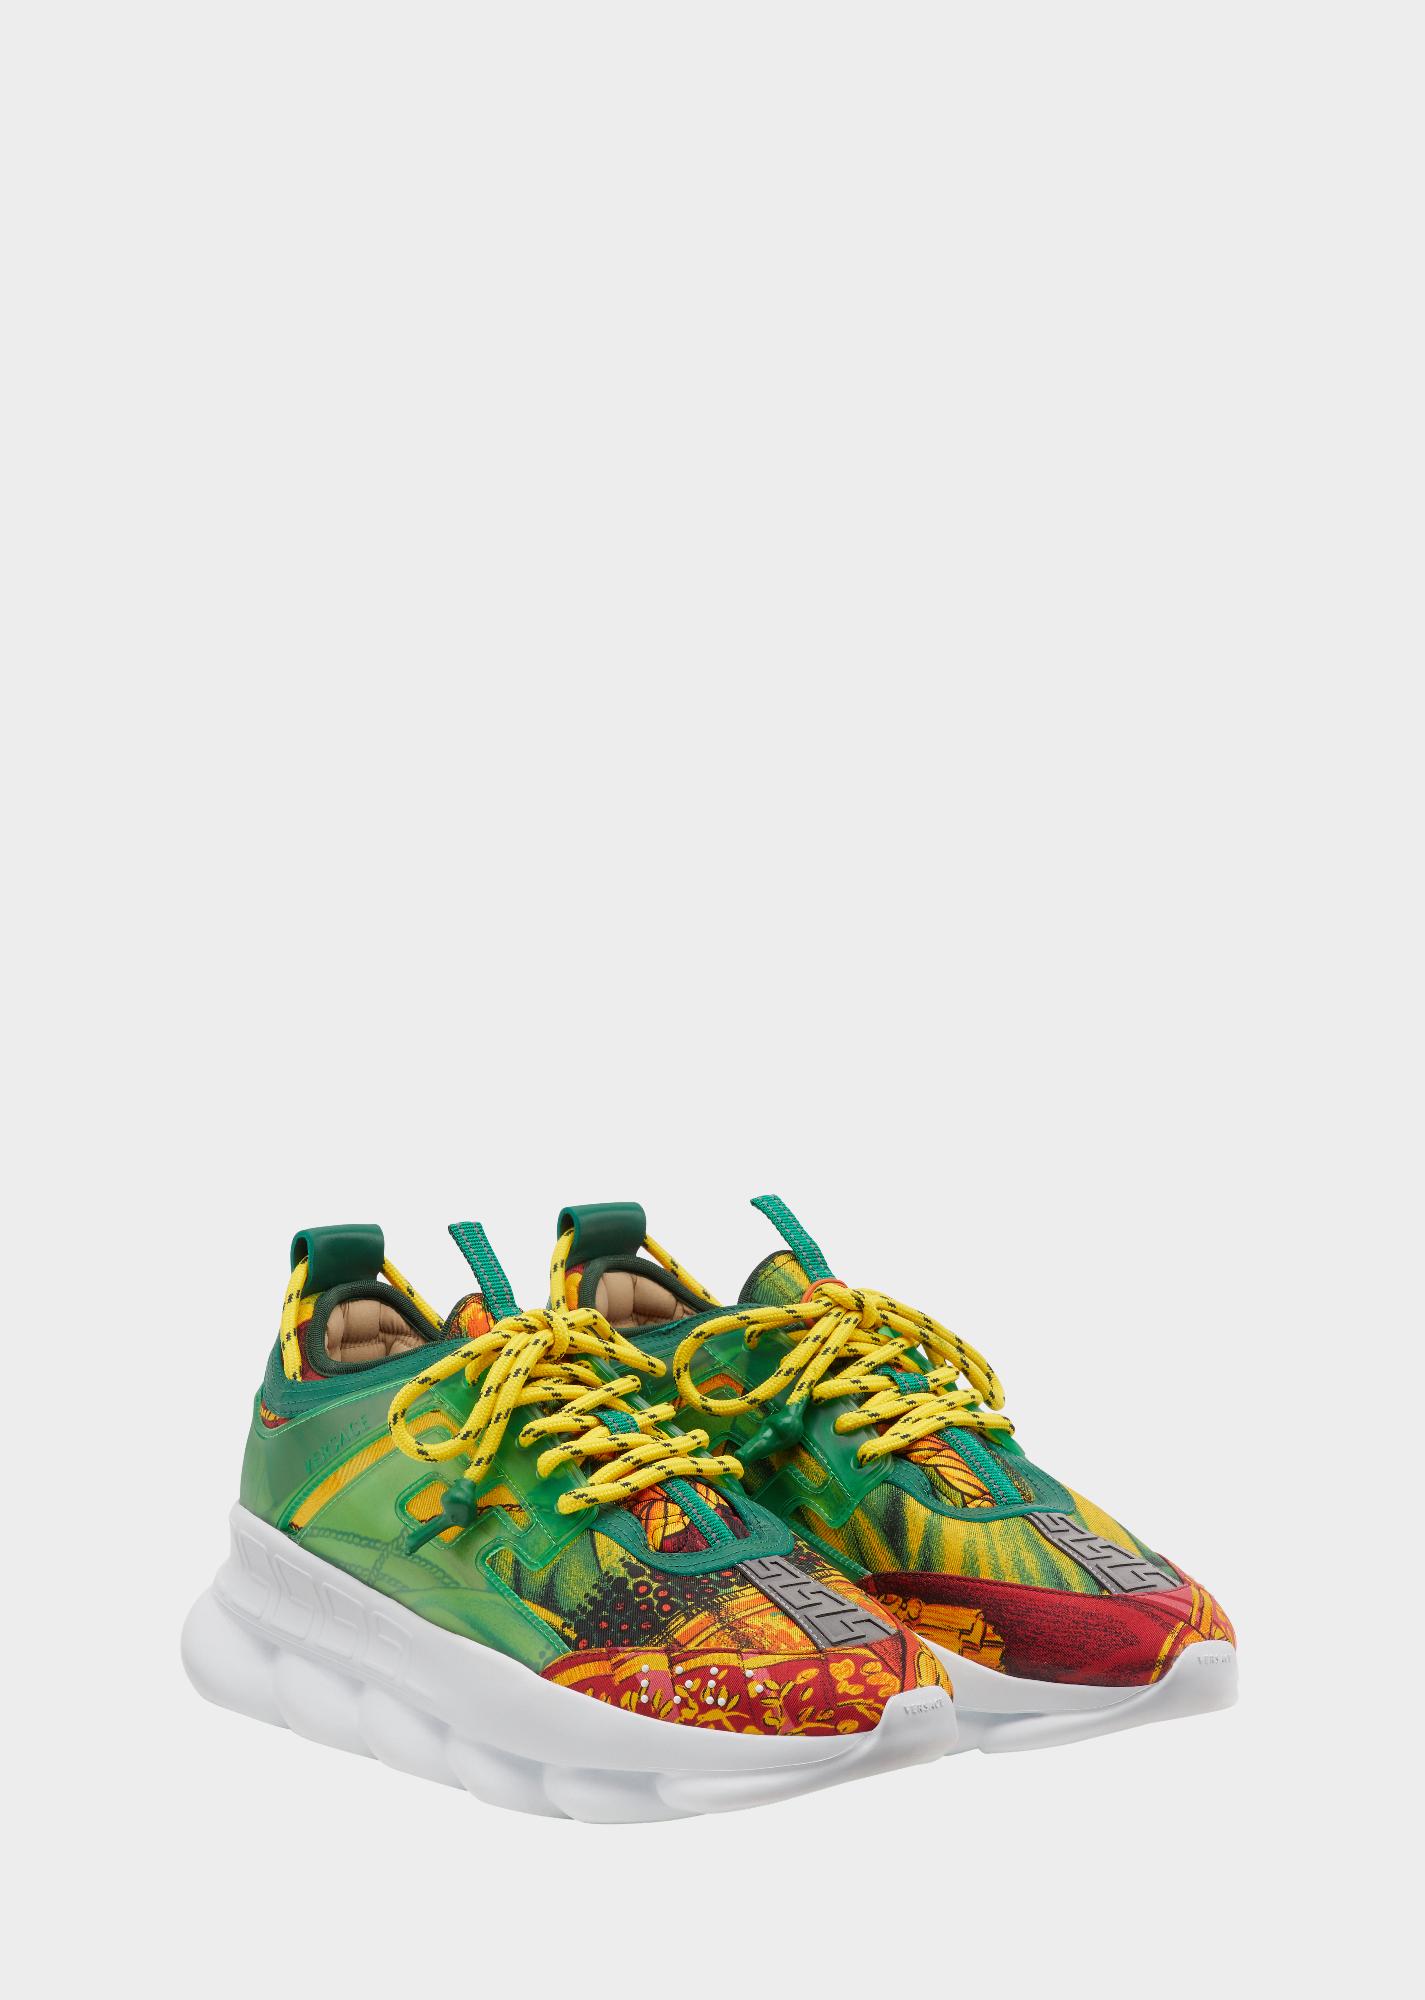 ee5ec25f34 Chain Reaction Sneakers for Men   Official Website   Versace chain ...